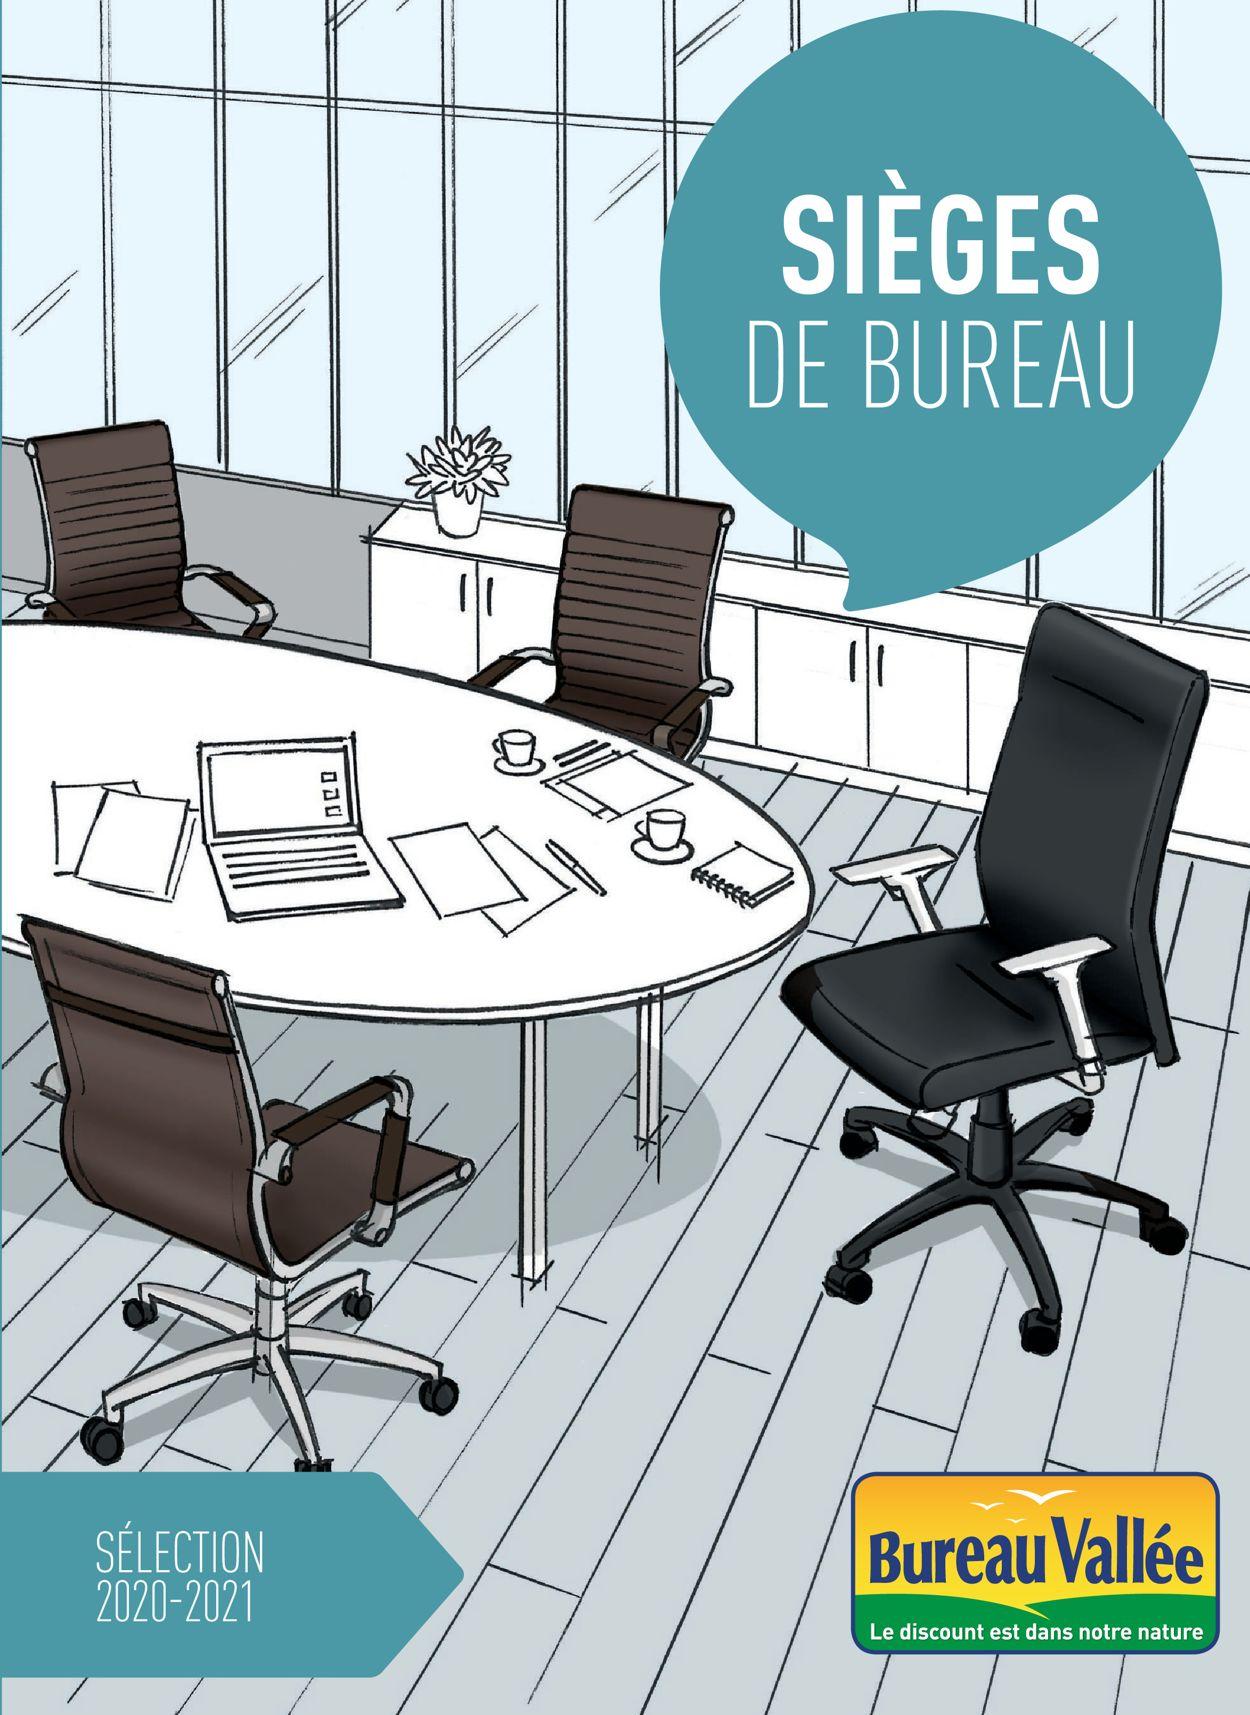 Bureau Vallée Sièges de Bureau 2021 Catalogue - 31.12-30.06.2021